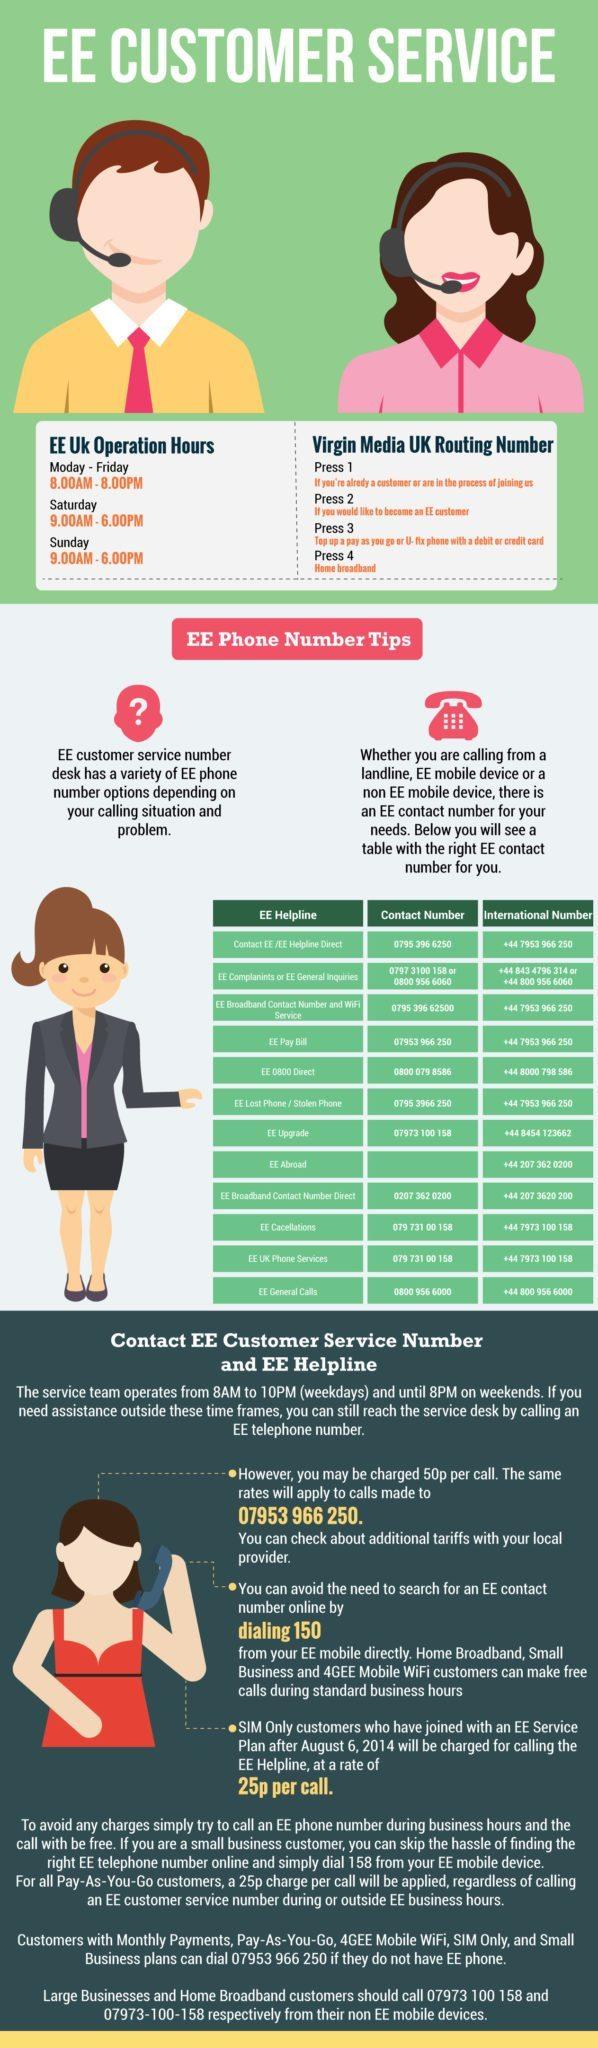 EE Customer Service Numbers